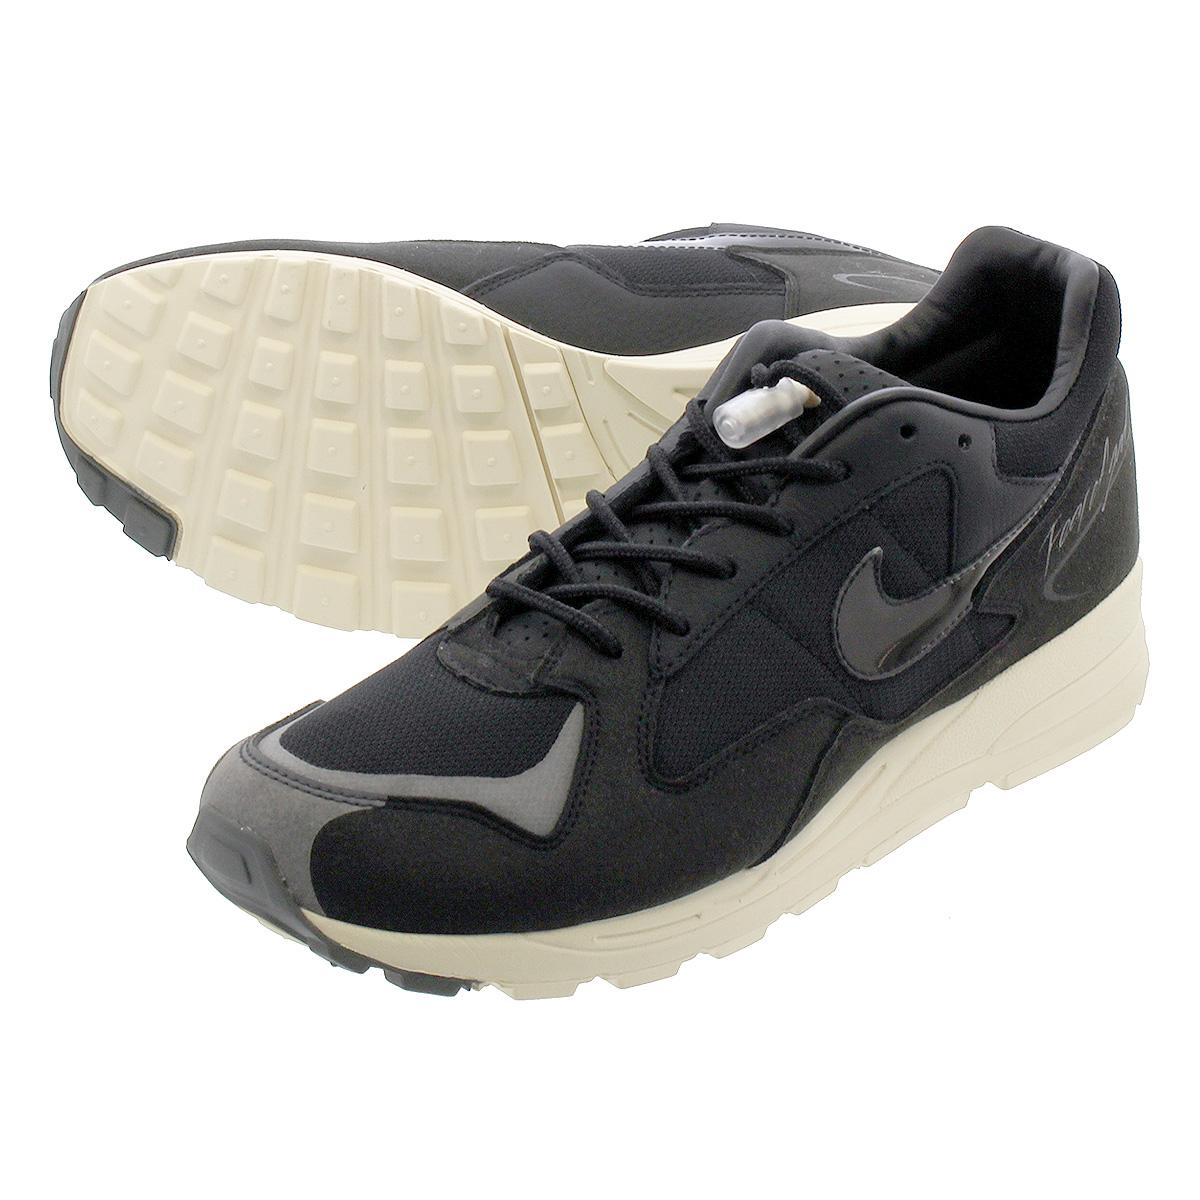 best sneakers 0ba75 b437f NIKE AIR SKYLON II FOG Kie Ney Asuka irone 2 Fear of god BLACK SAIL FOSSIL  bq2752-001